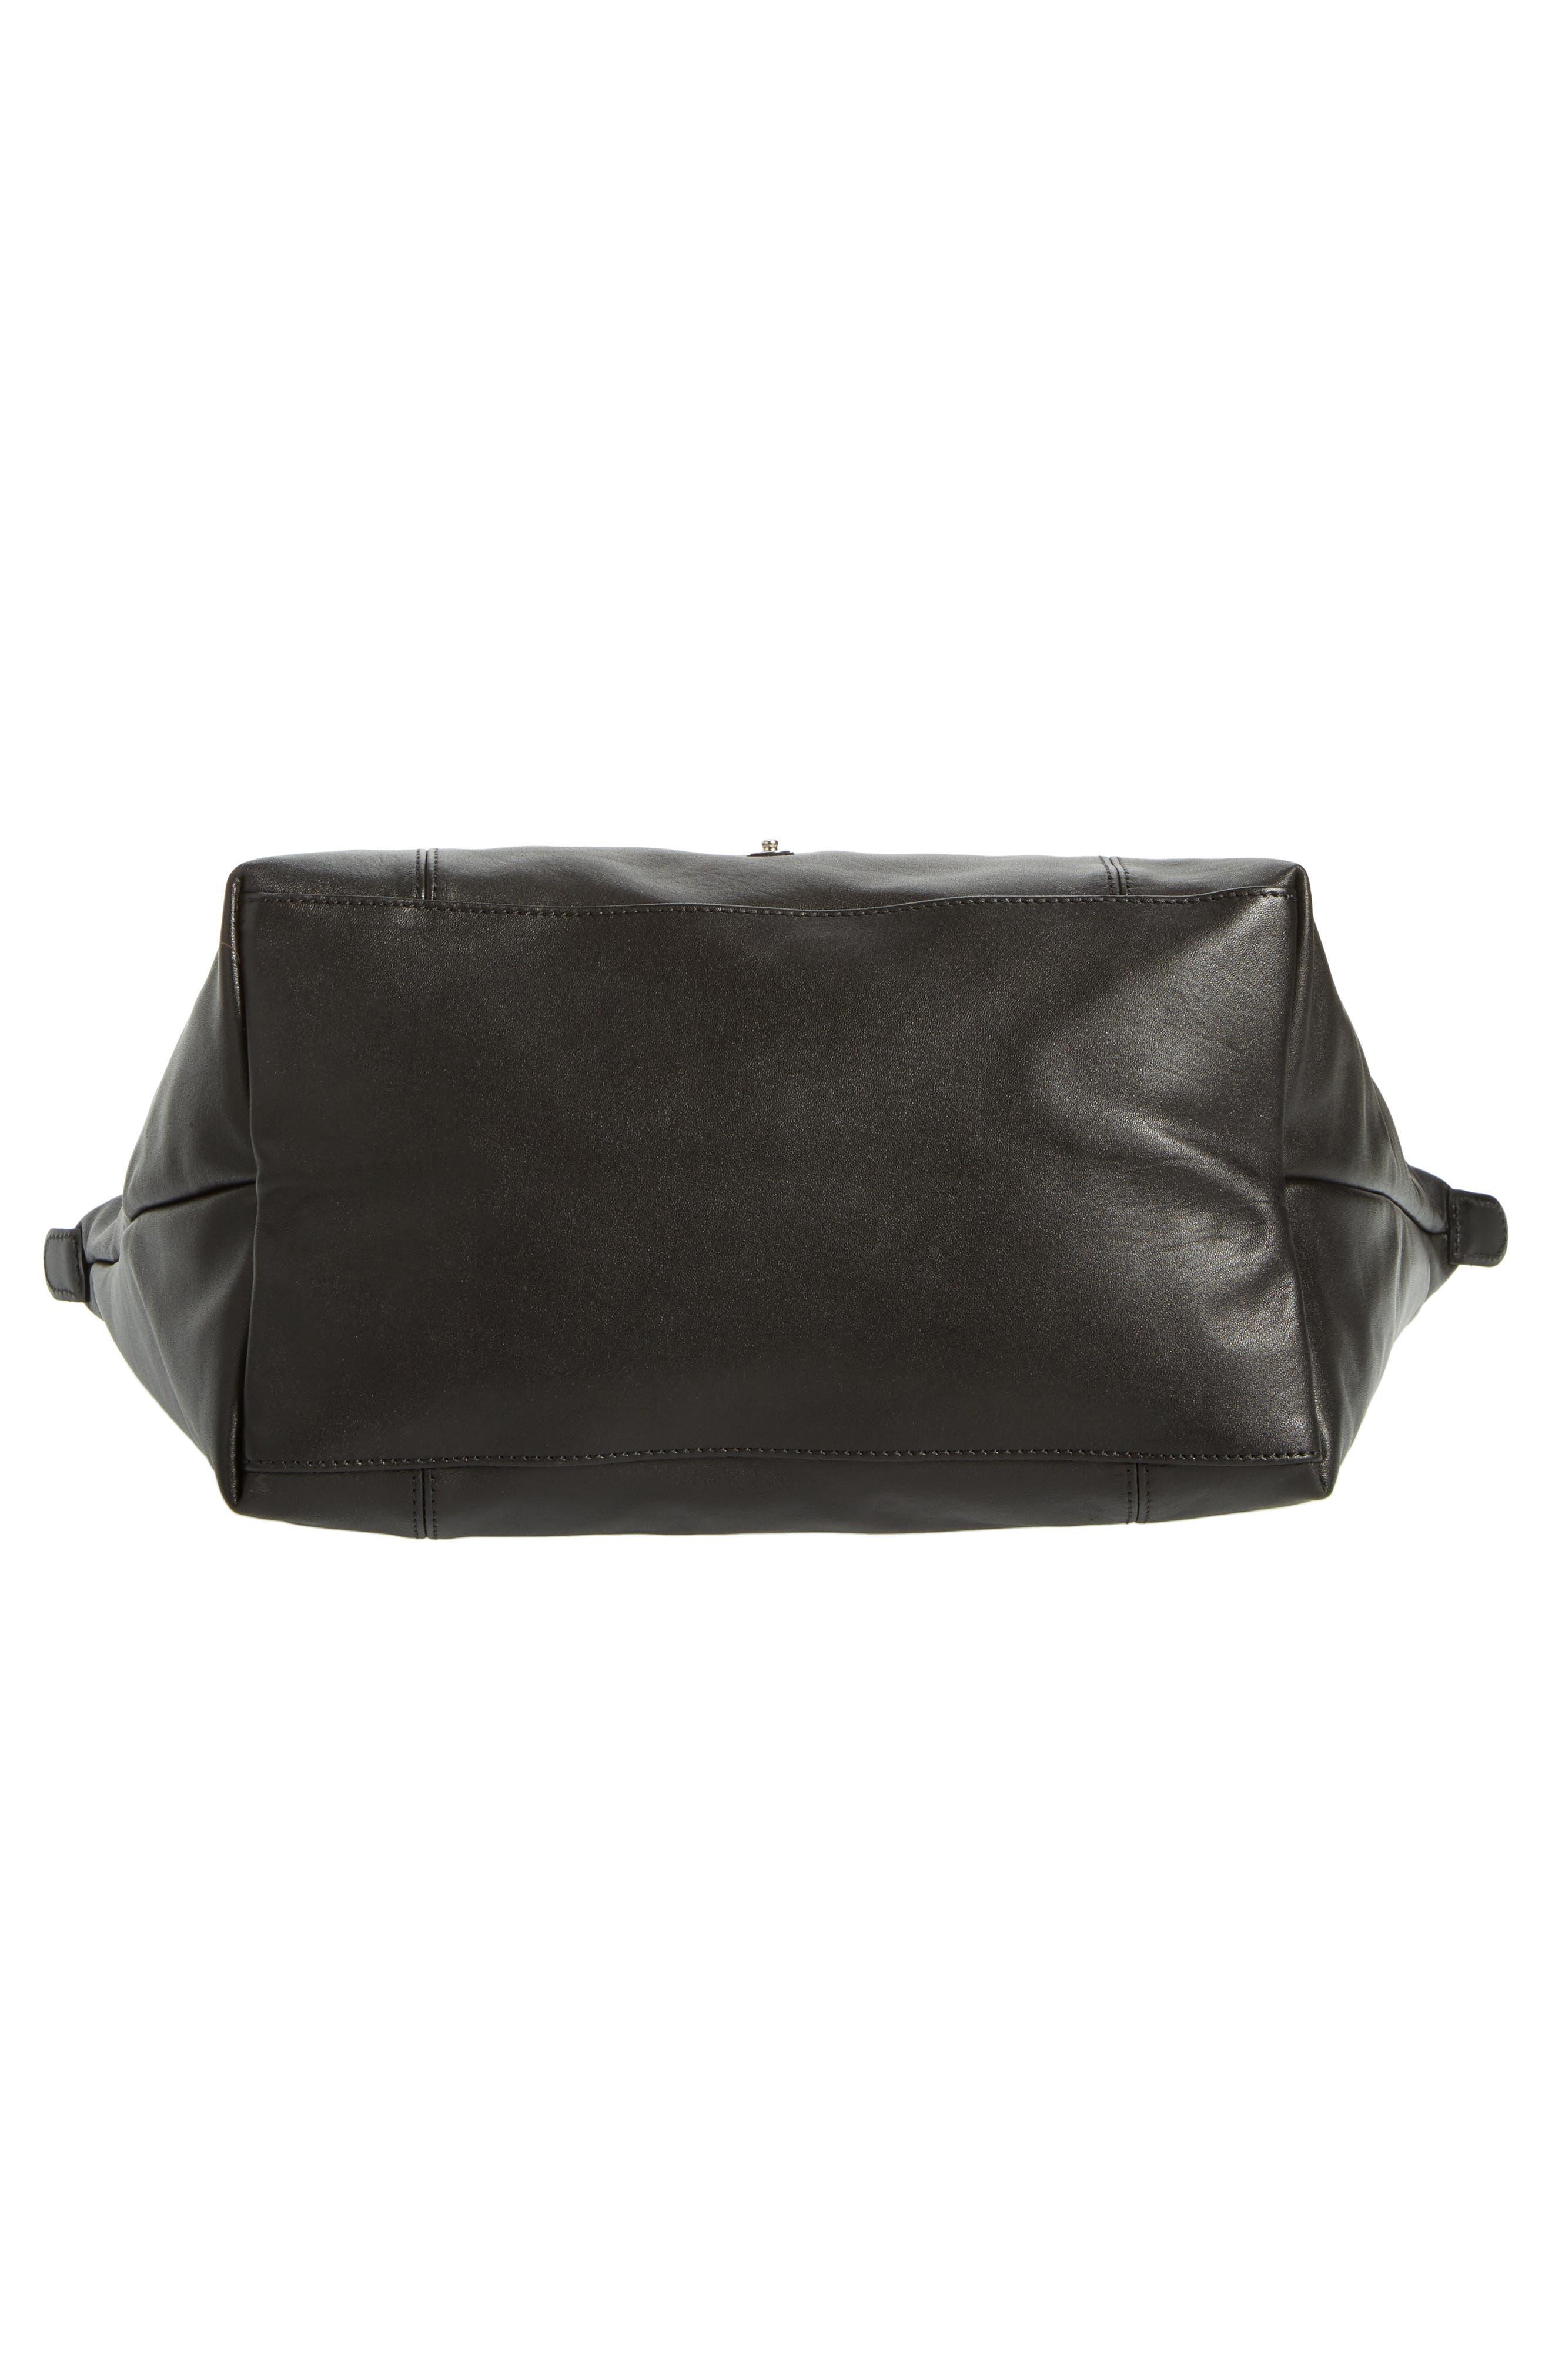 Le Pliage Cuir Leather Tote,                             Alternate thumbnail 7, color,                             BLACK